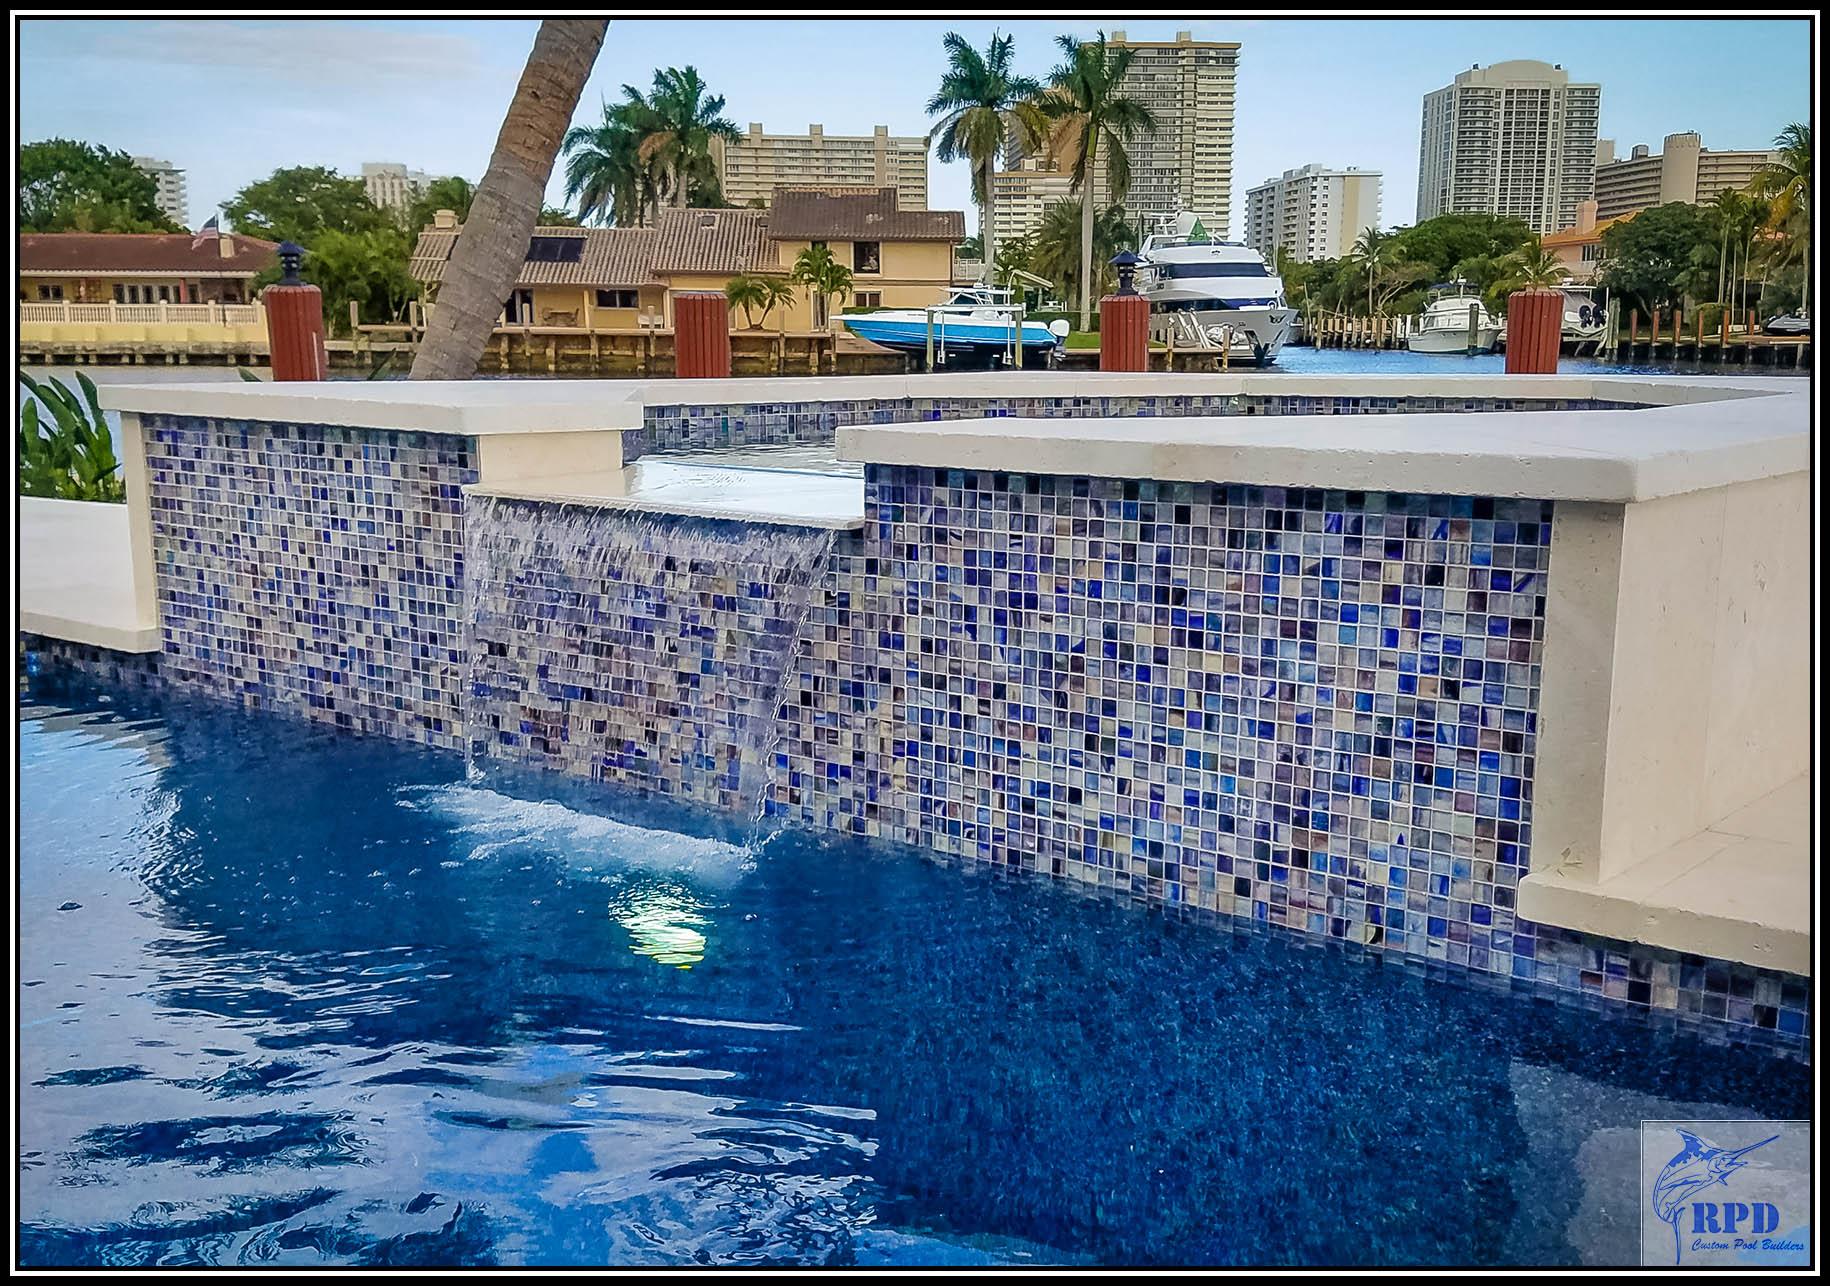 ©RPD-Fernicola-Remodel-Fort-Lauderdale-Apr2017-KTO0021.jpg